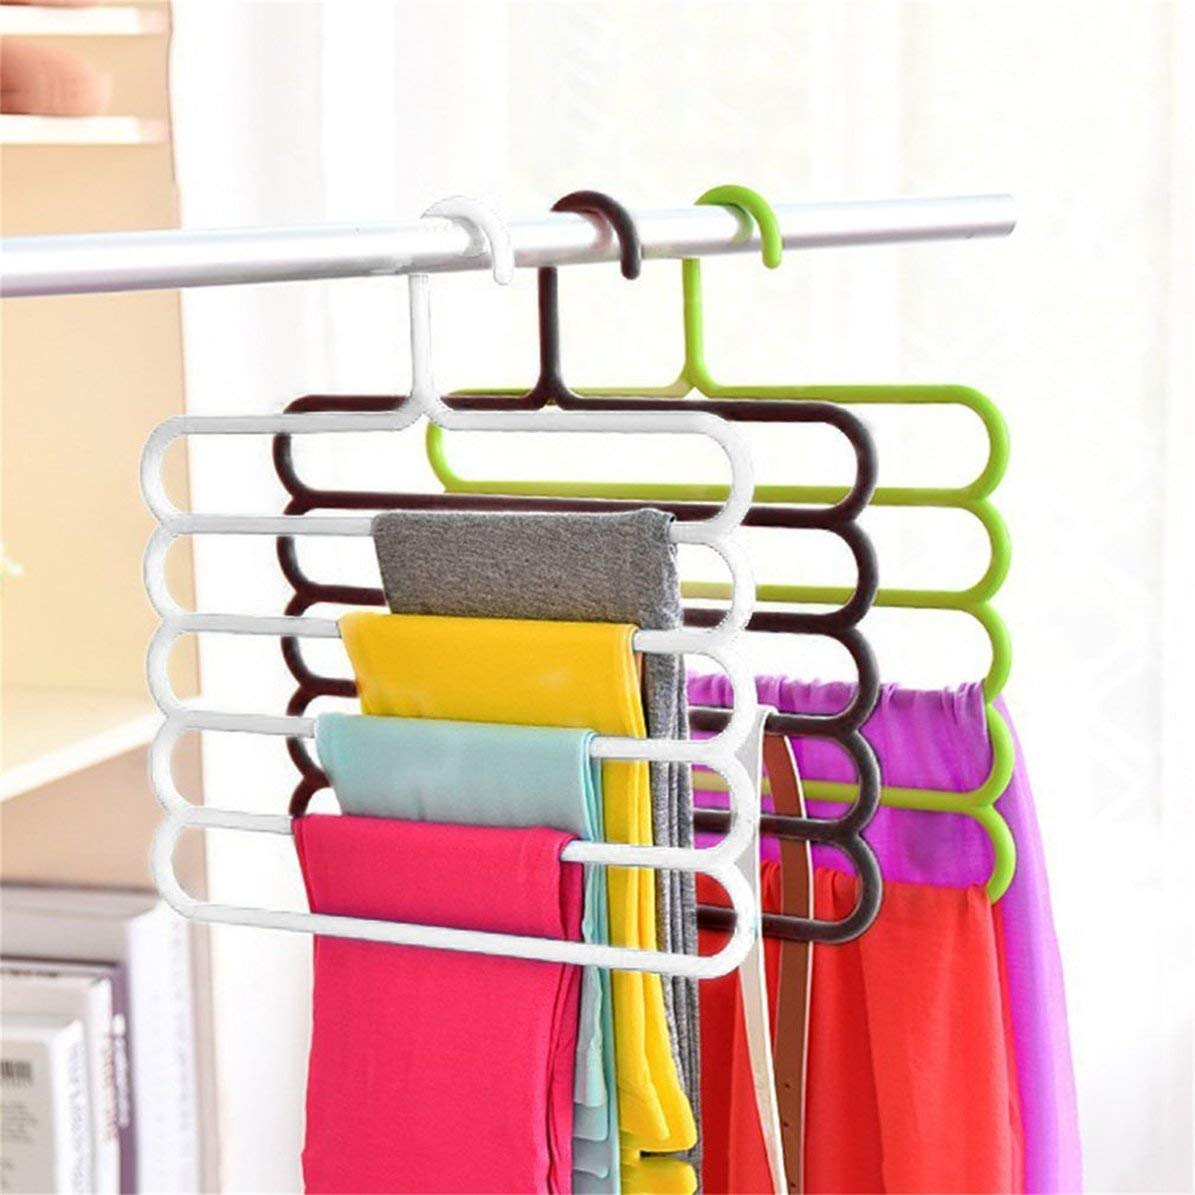 WEIWEITOE Anti-slip Magic Multiple Layer Trousers Hanger Multifunction Pants Closet Belt Holder Rack S-type 5 Layers Saving Space,Bronze,